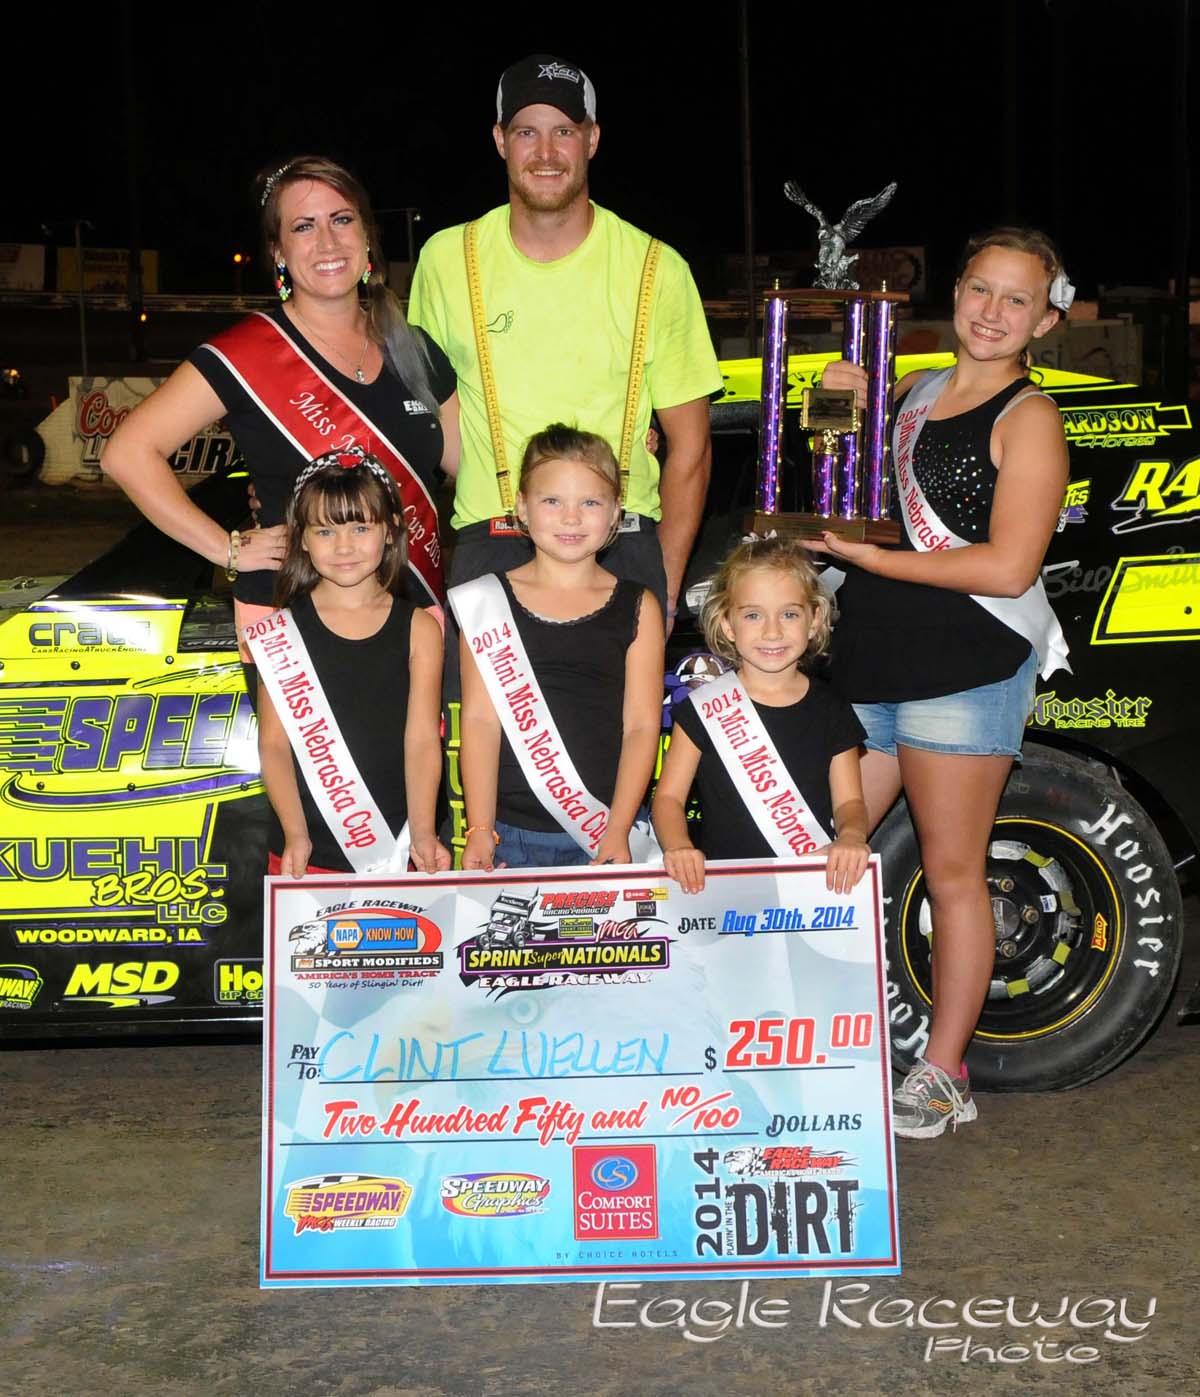 Eagle-08-30-14-448-Clint-Luellen-with-2013-Miss-Nebraska-Cup-Elle-Potocka-along-with-2014-Mini-Miss-Nebraska-Cup-finailist-and-flagman-Billy-Lloyd-JoeOrthPhoto